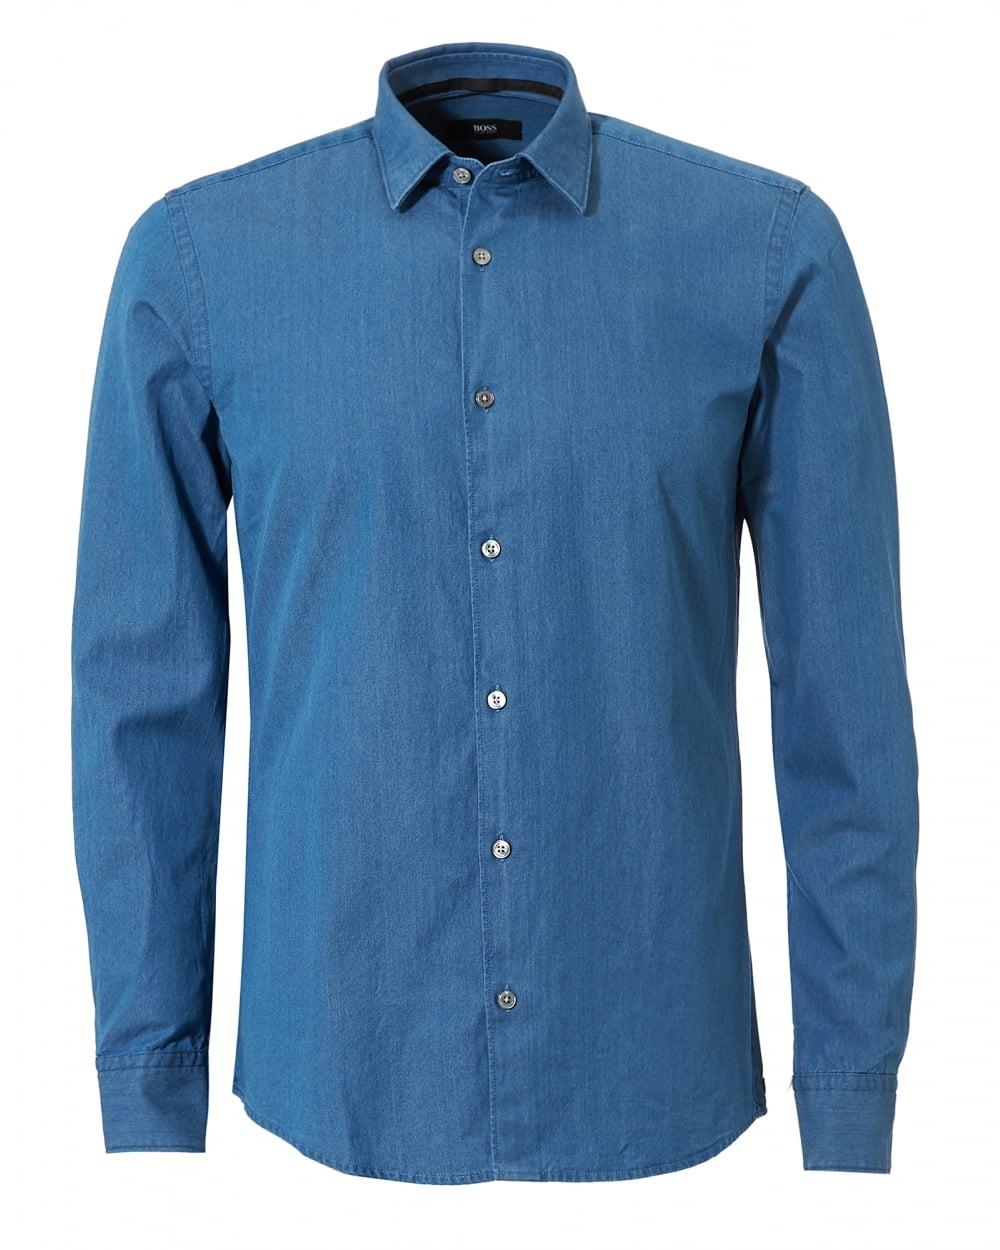 7c5b2f6a99 Hugo Boss Black Mens Reid_F Denim Look Slim Fit Indigo Shirt